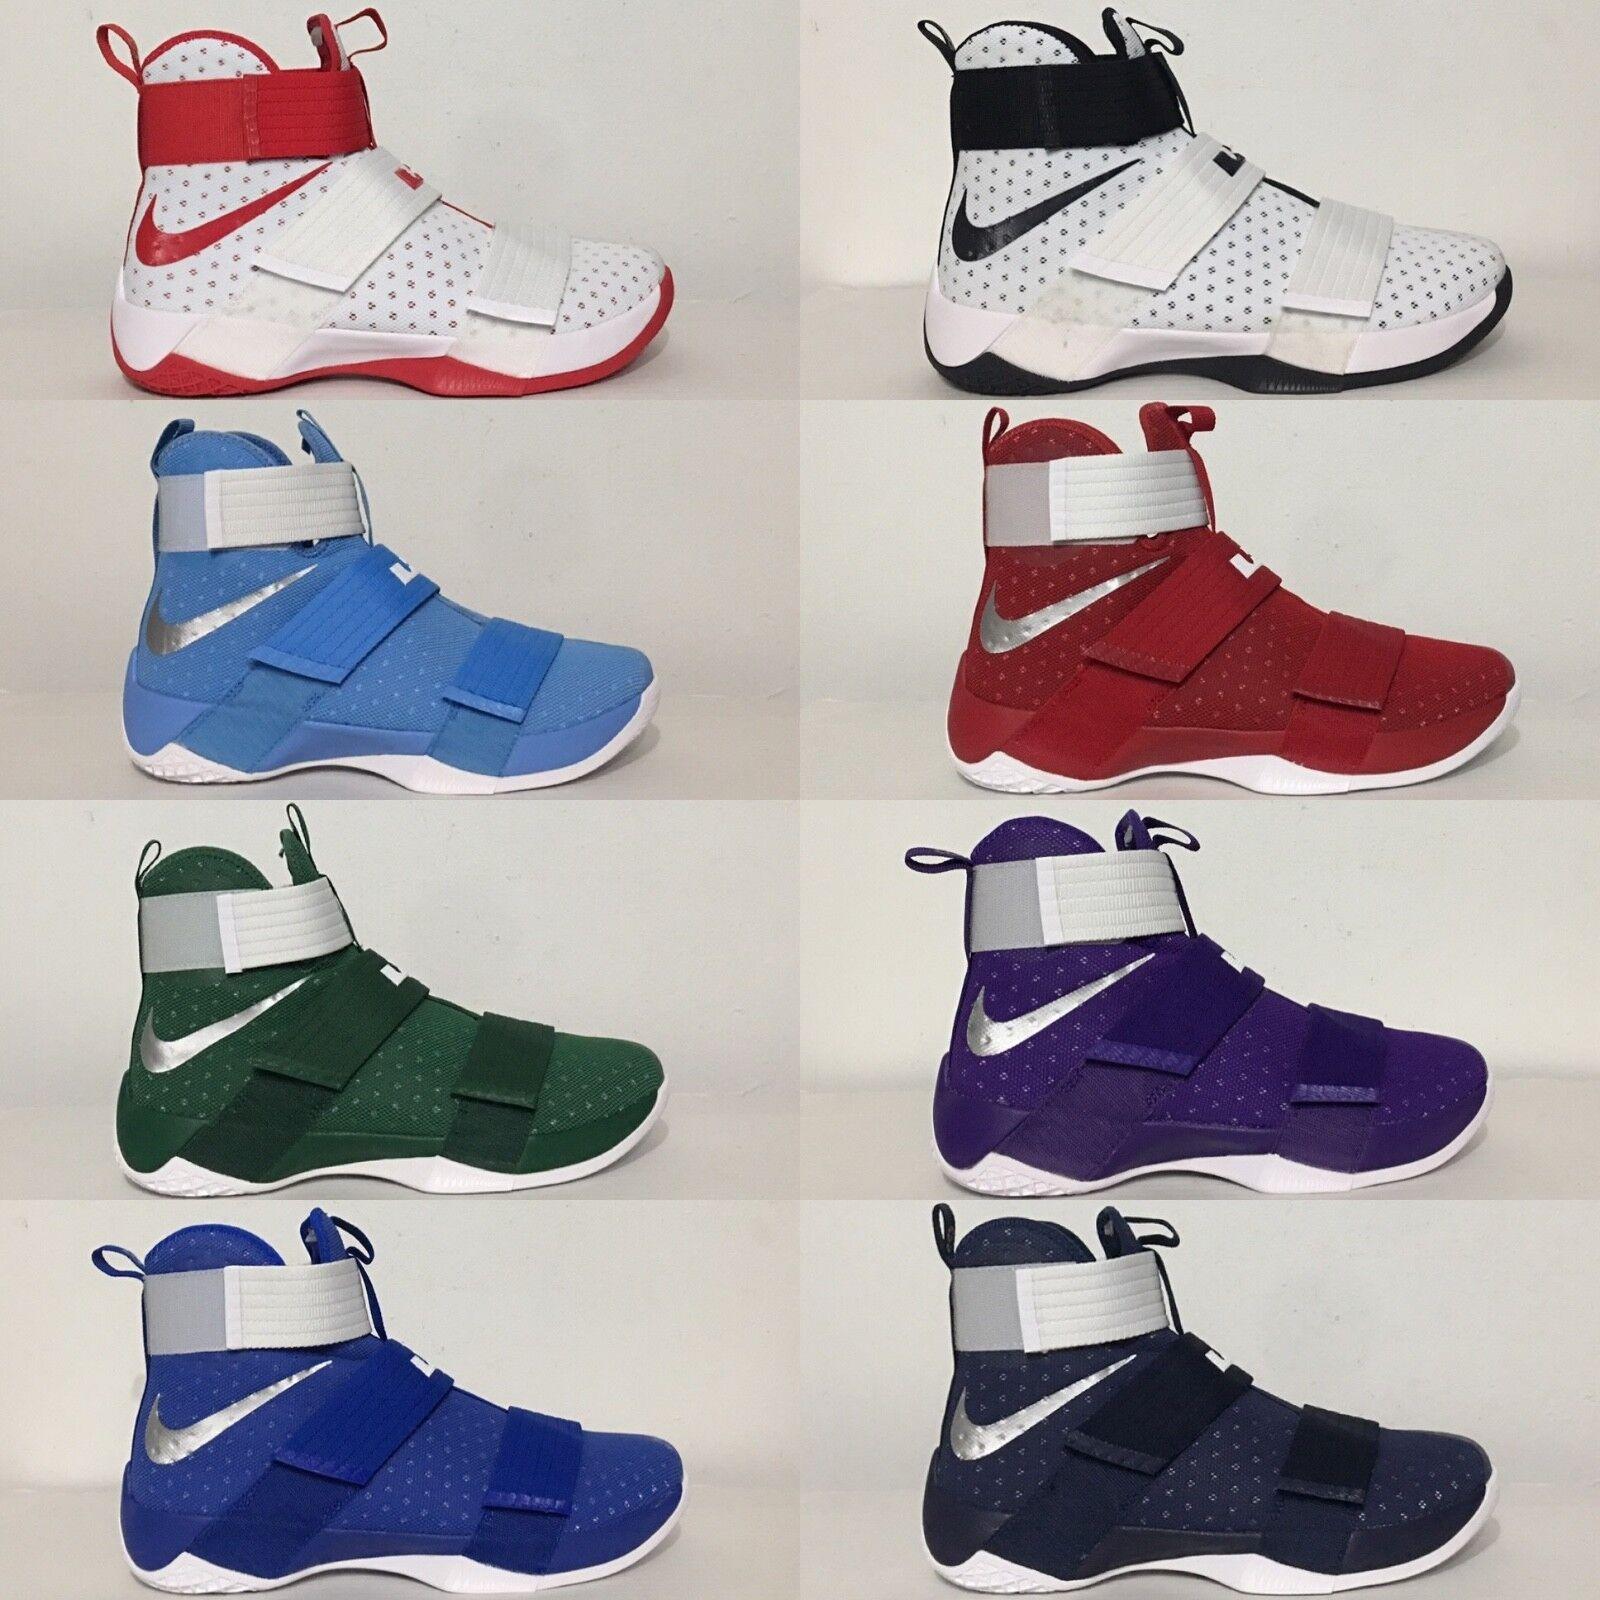 Nike lebron x 10 tb promo scarpe scarpe scarpe da basket 856489 | Ricca consegna puntuale  8bb0fb